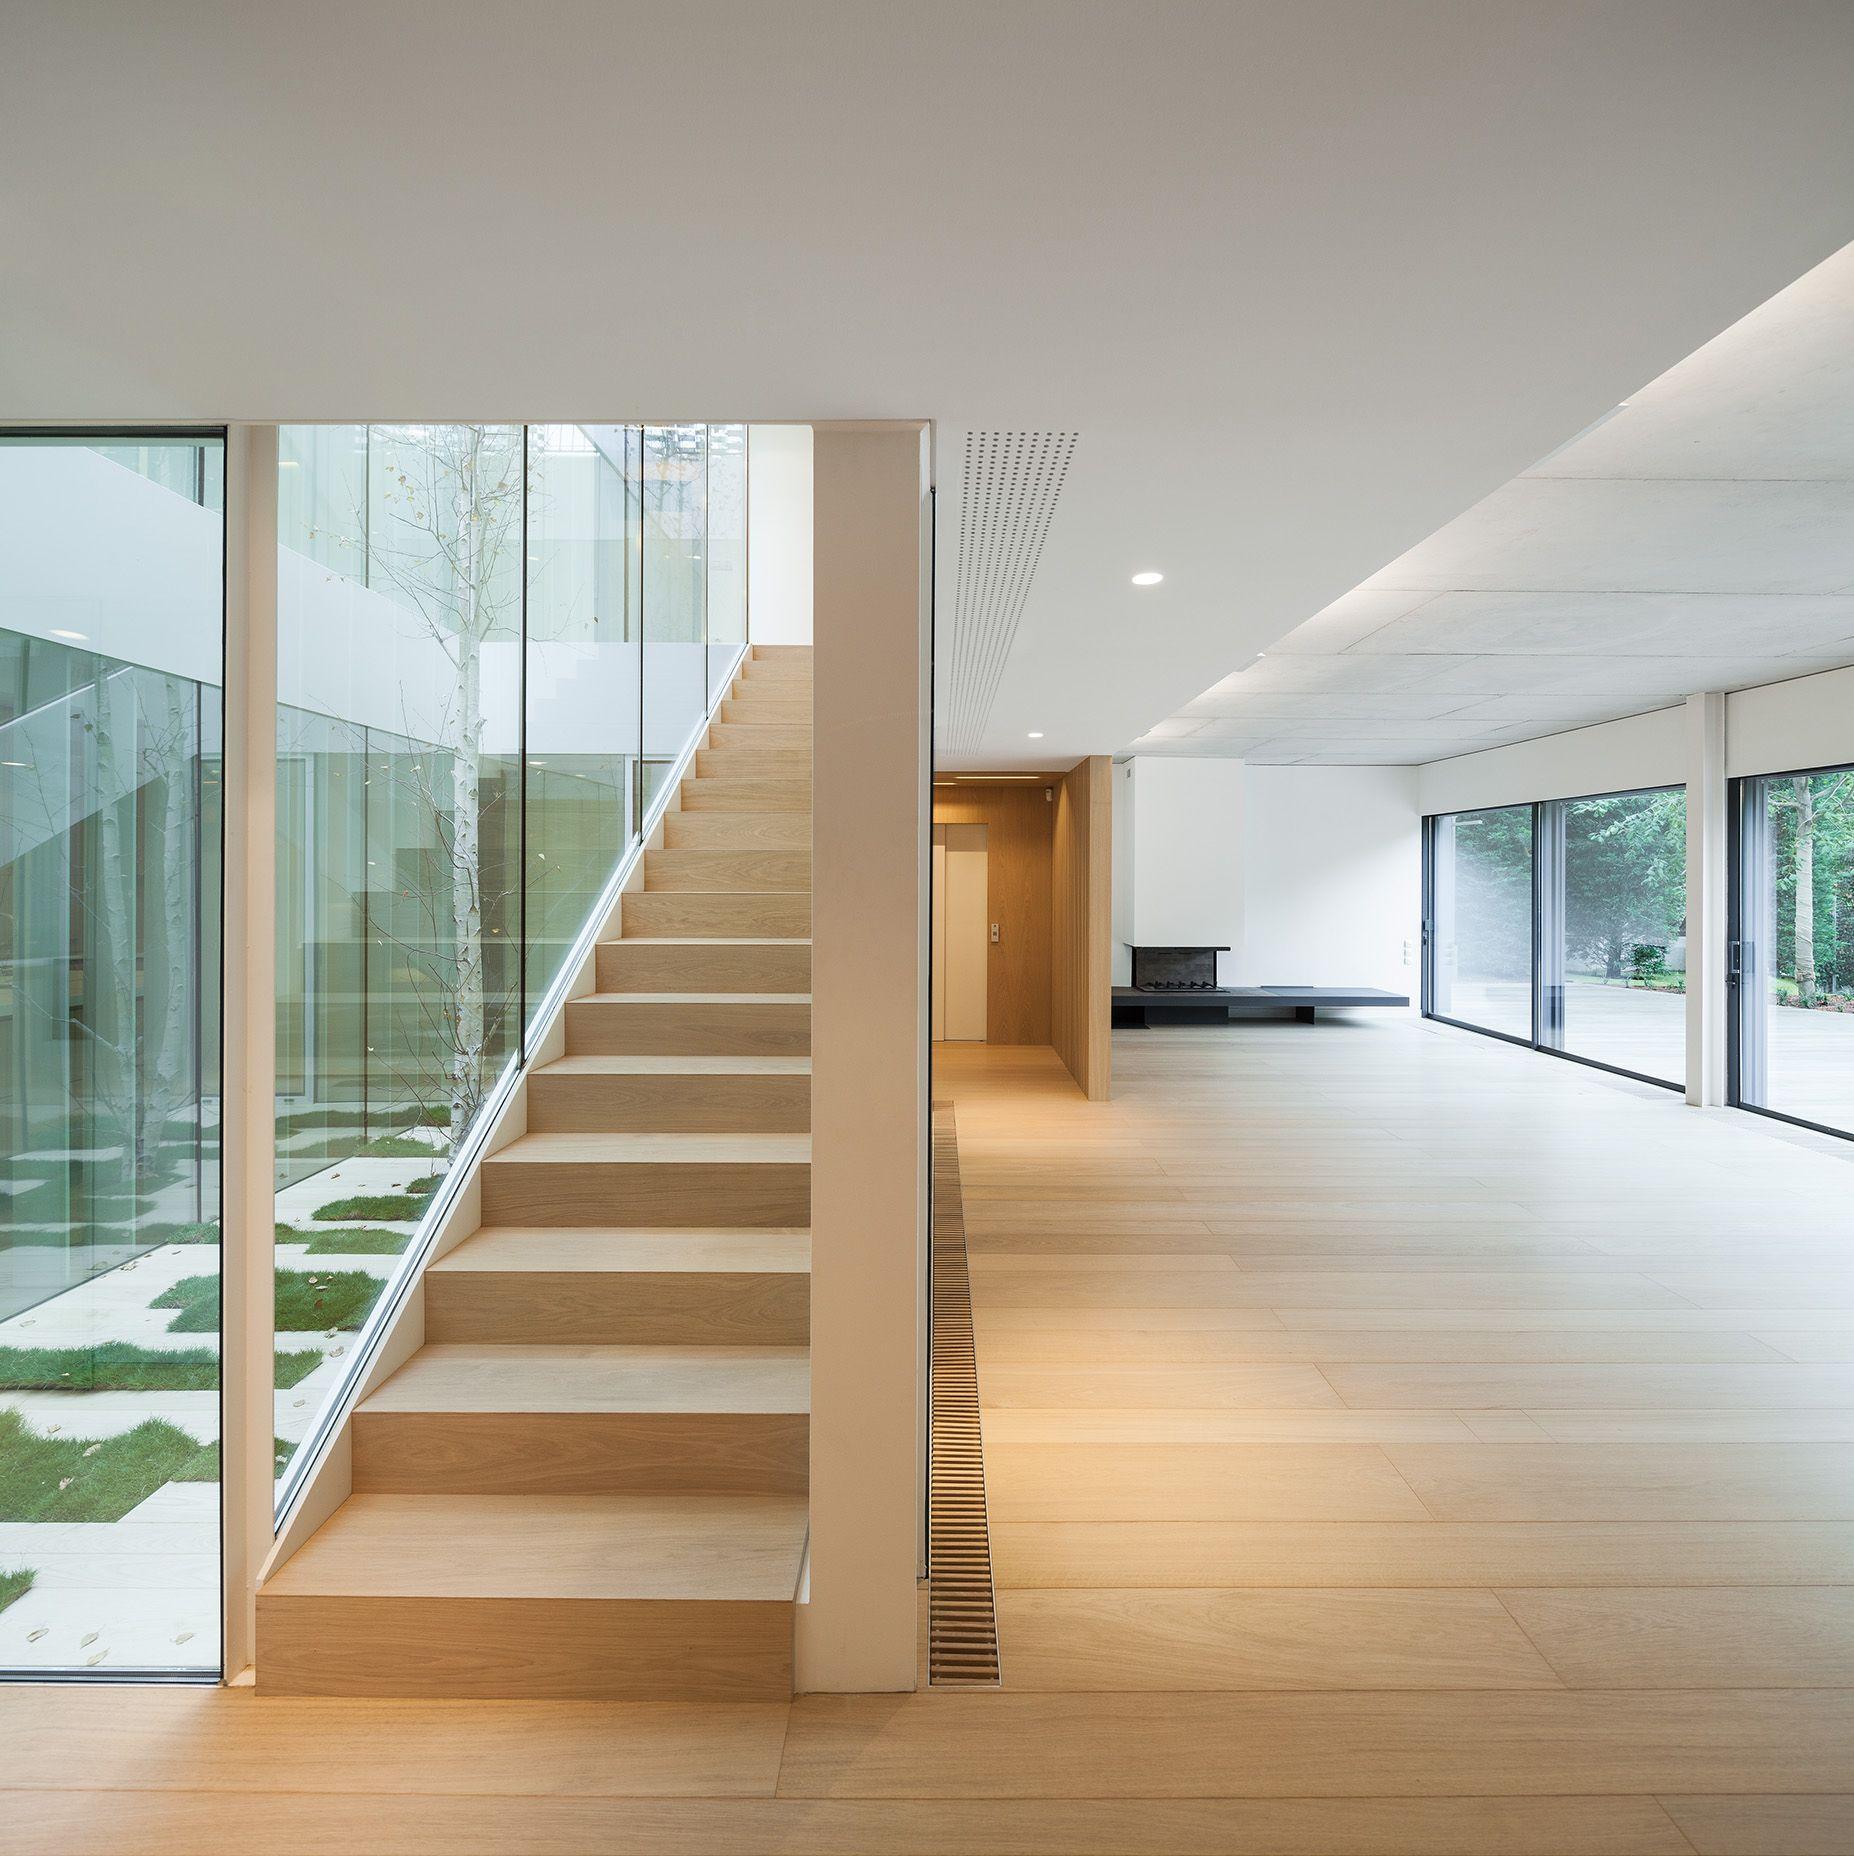 Tr house in barcelona by pmmt escaleras casas for Casa minimalista barcelona capital